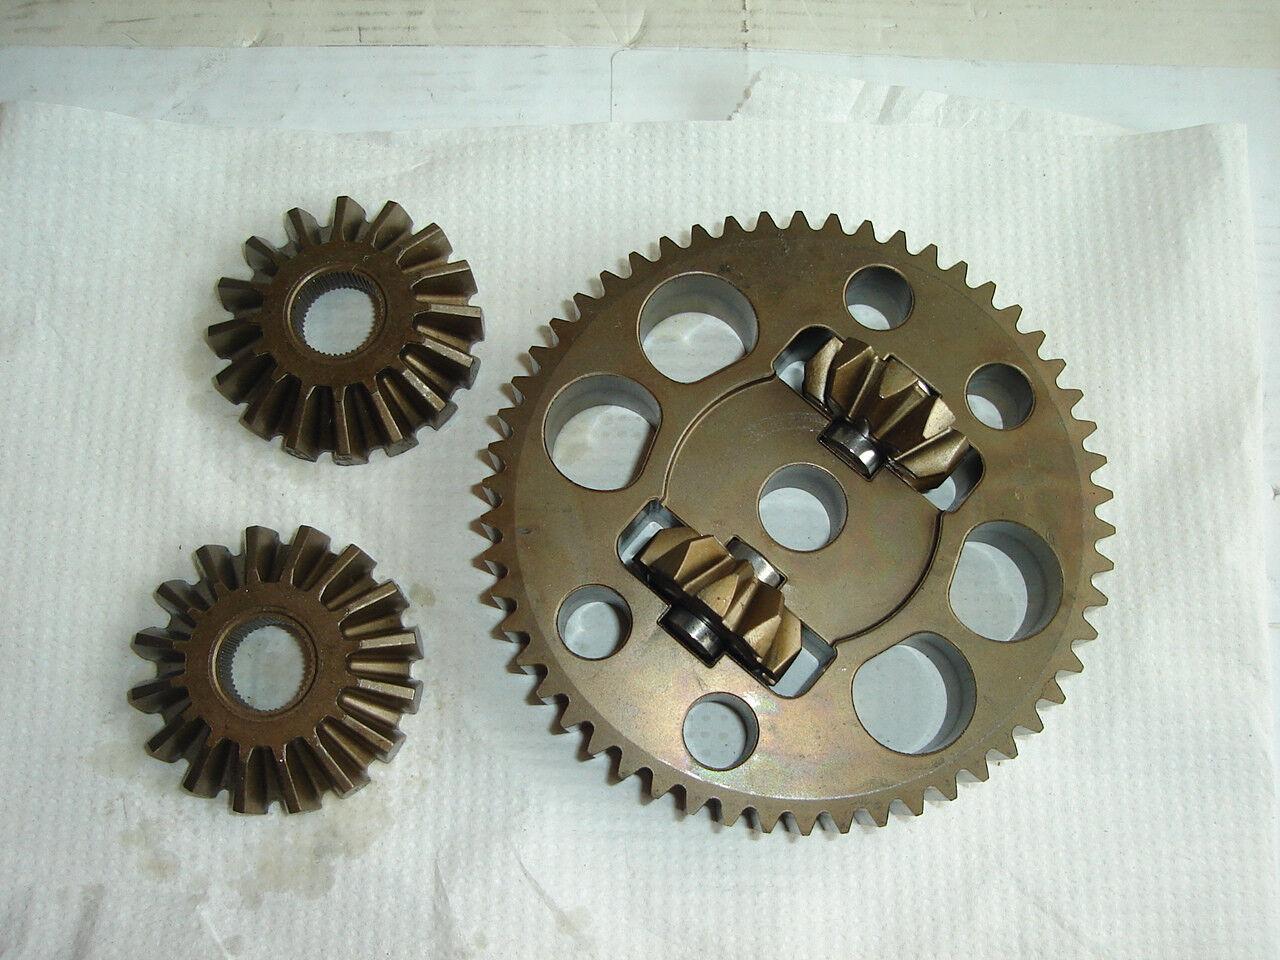 TUFF Torq diferencial Gear K46 1A646033520 1A646031570 K46BD K46AC John Deere